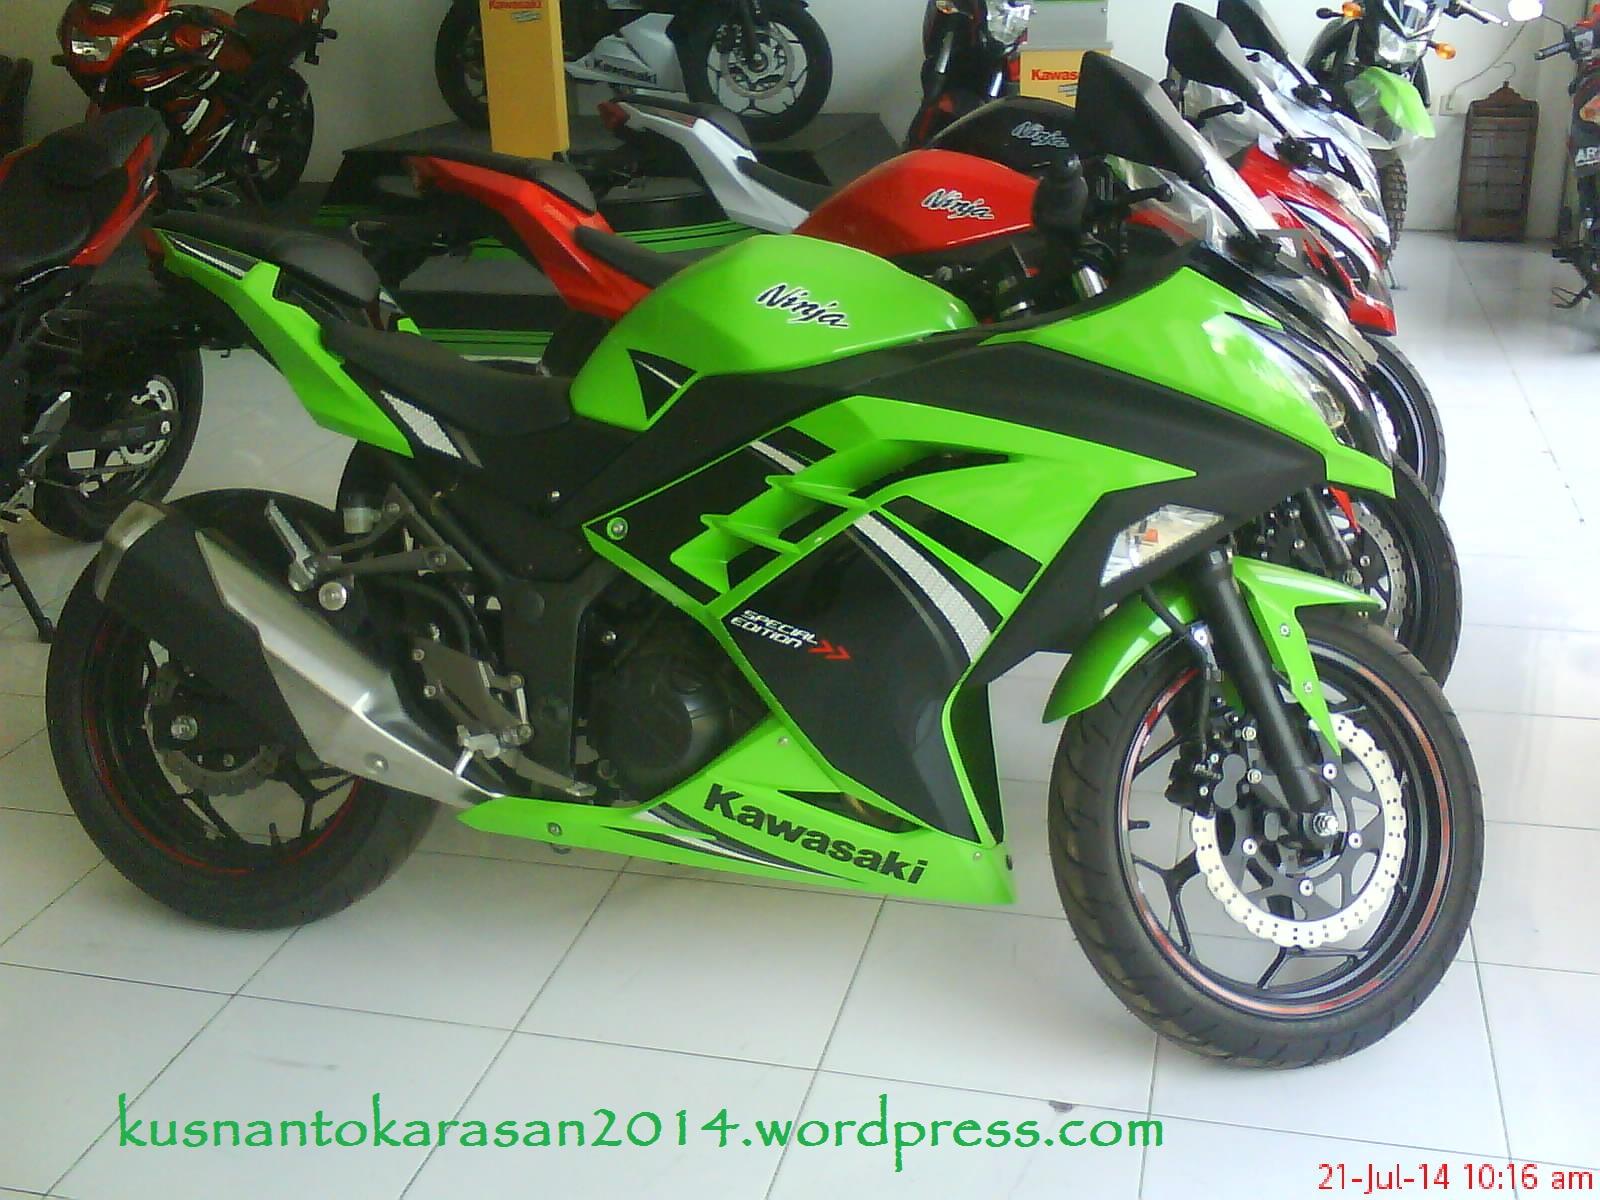 ninja 250r, motorsport idola semua idola, spesifikasi dan harga di